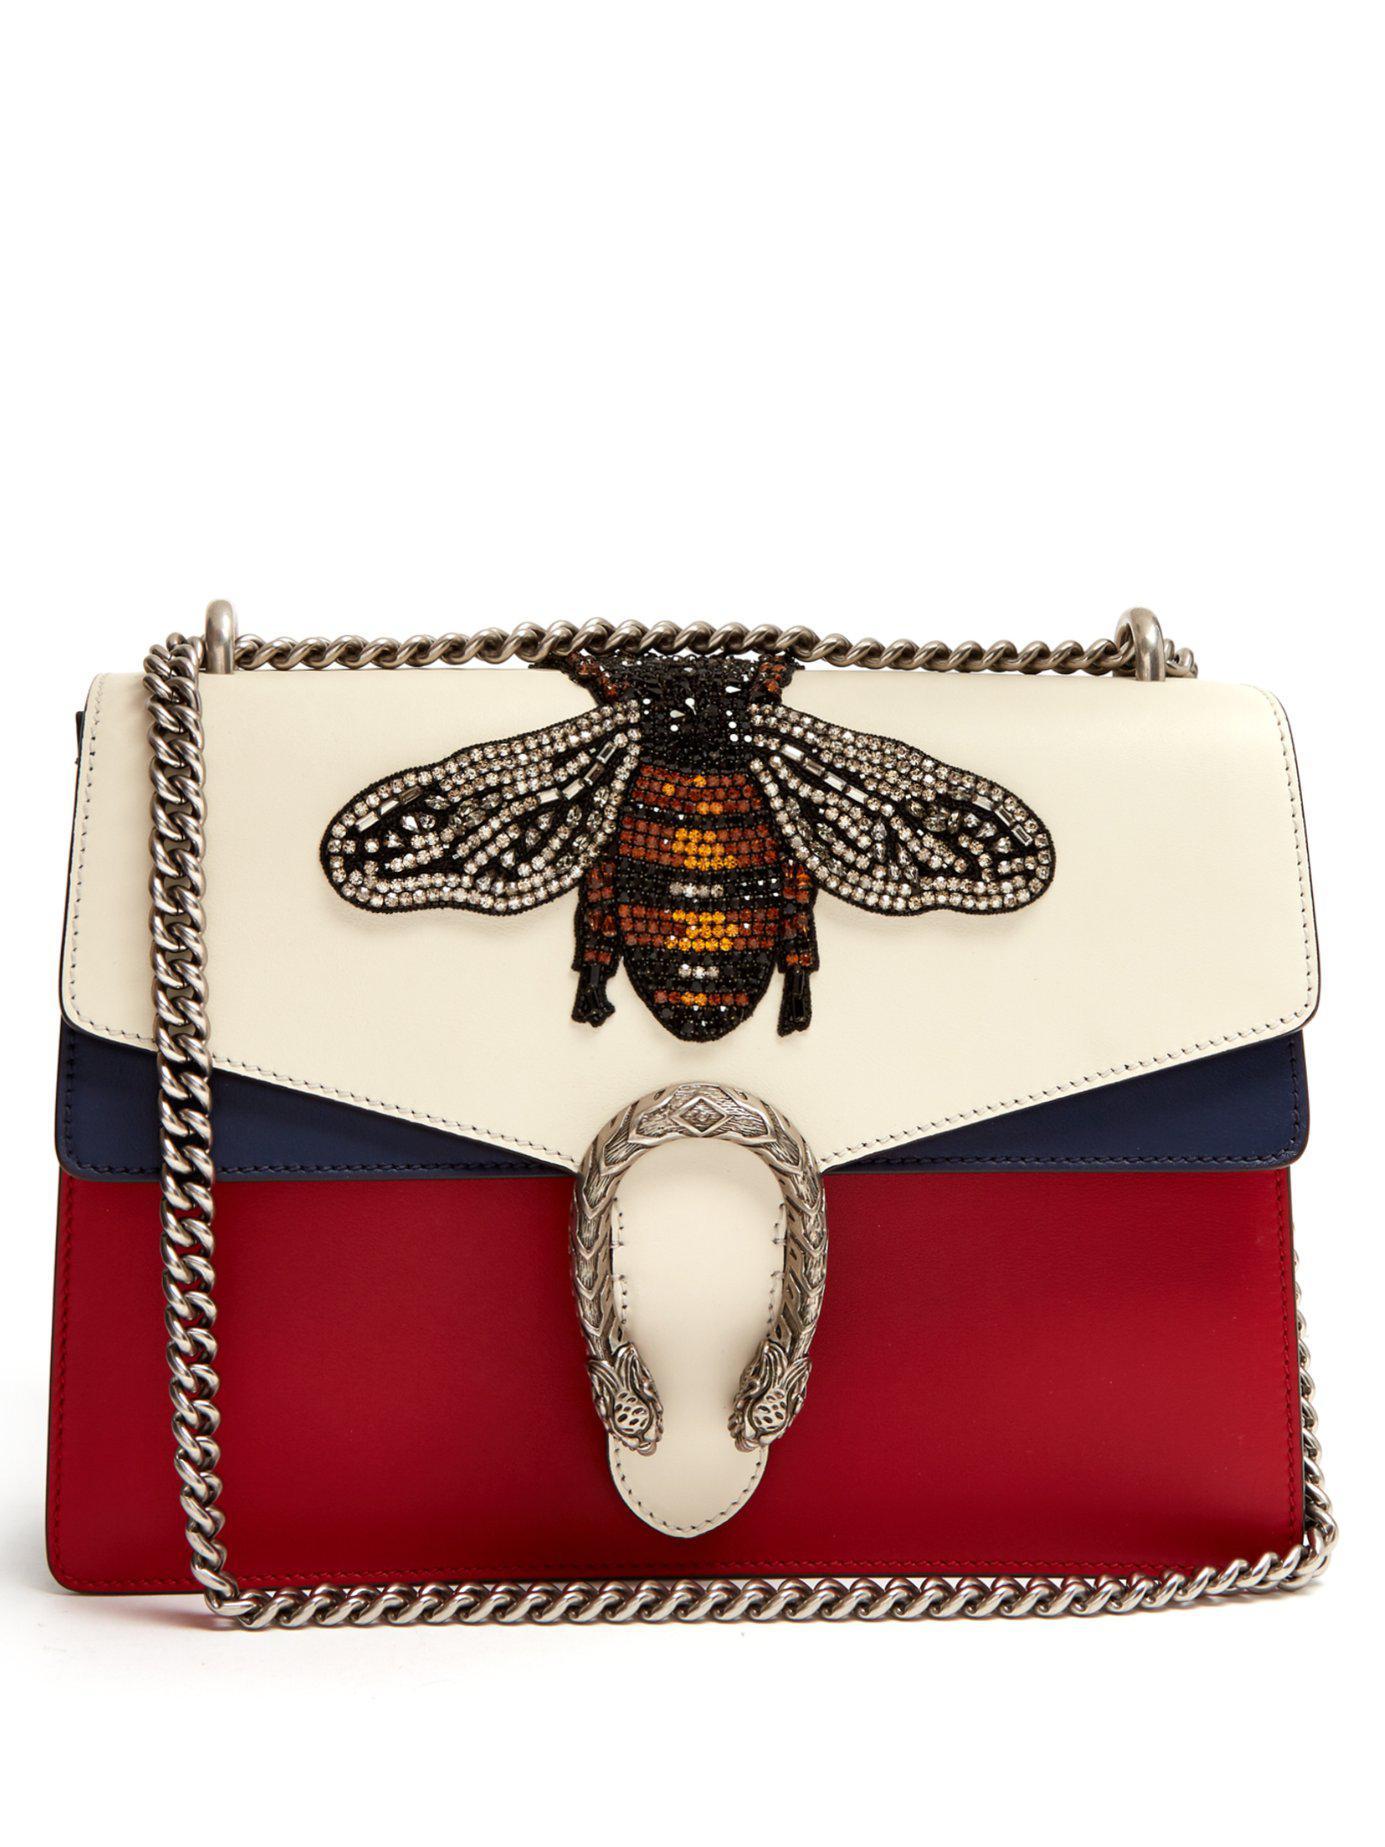 057bbbcfe96 Gucci. Women s Dionysus Large Bee Appliqué Leather Shoulder Bag